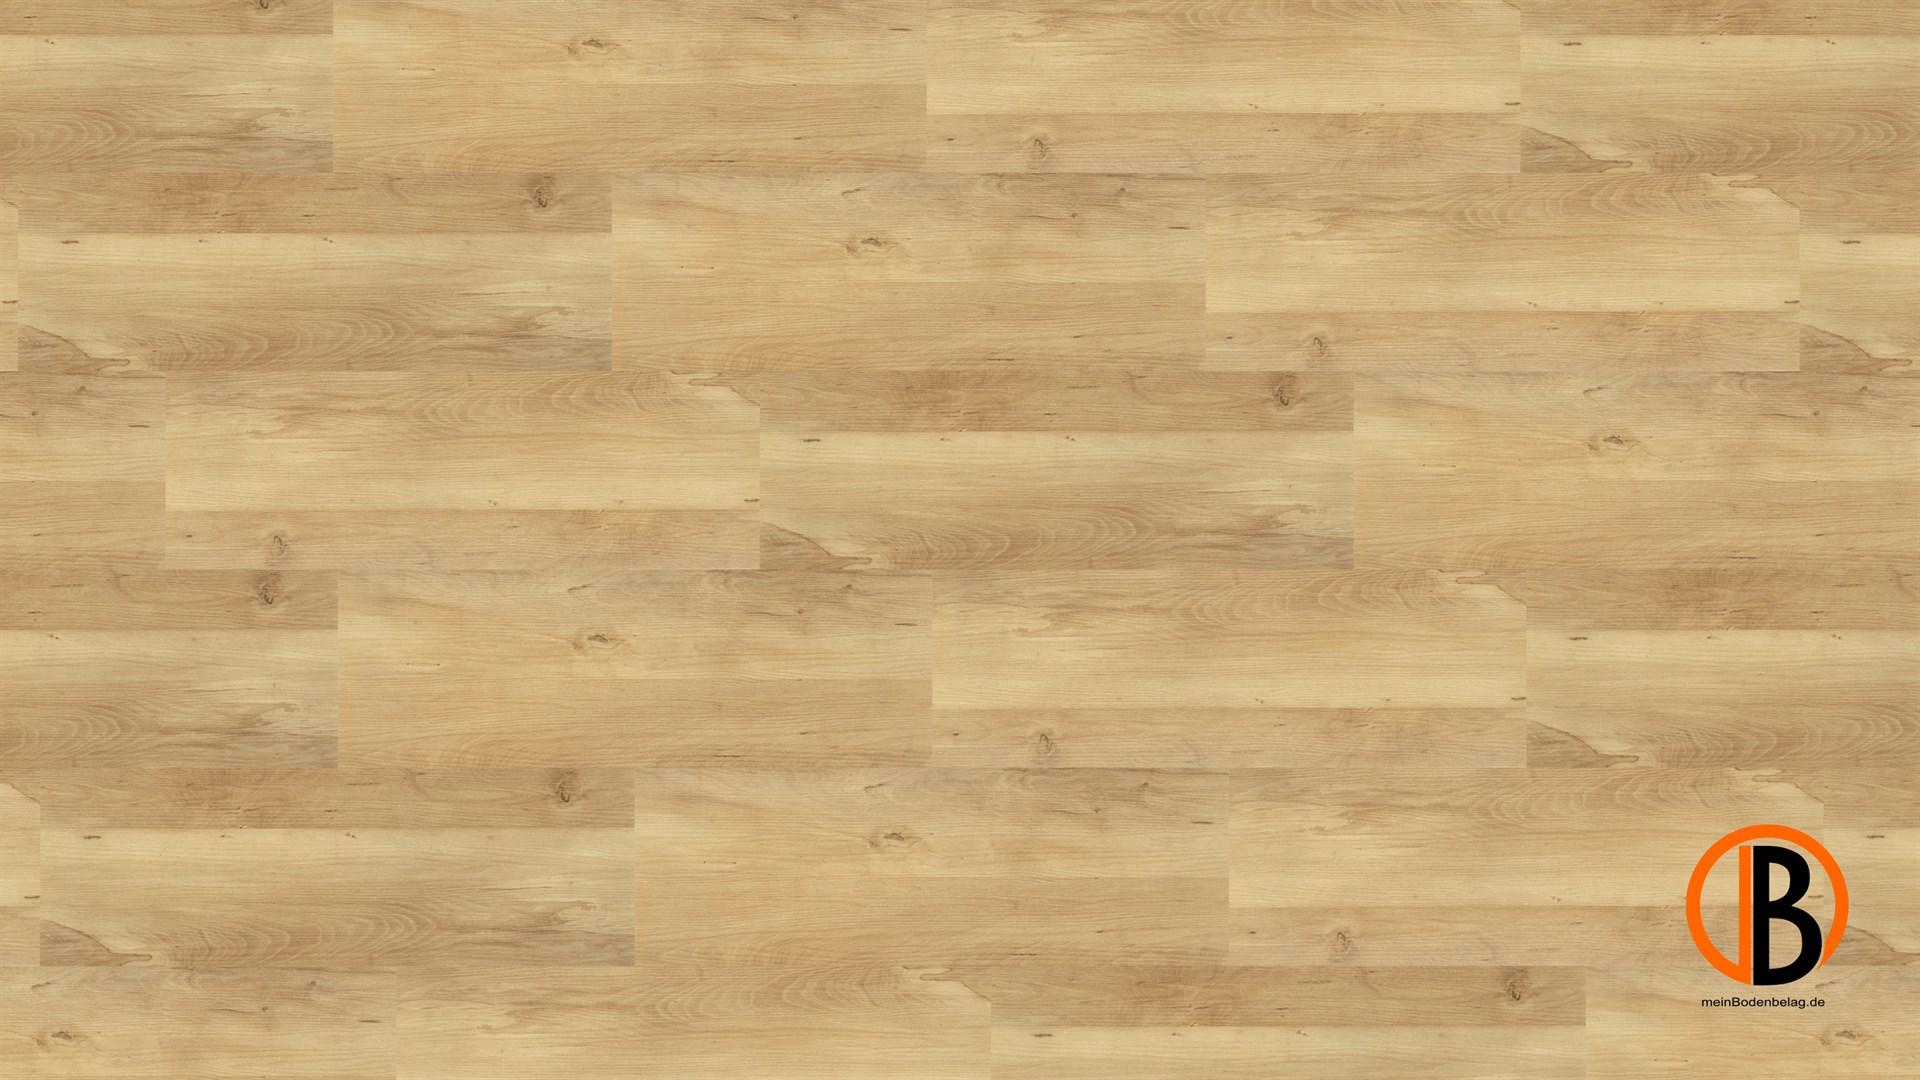 CINQUE KWG DESIGNERVINYL ANTIGUA CLASSIC SHEETS | 10000253;0 | Bild 1